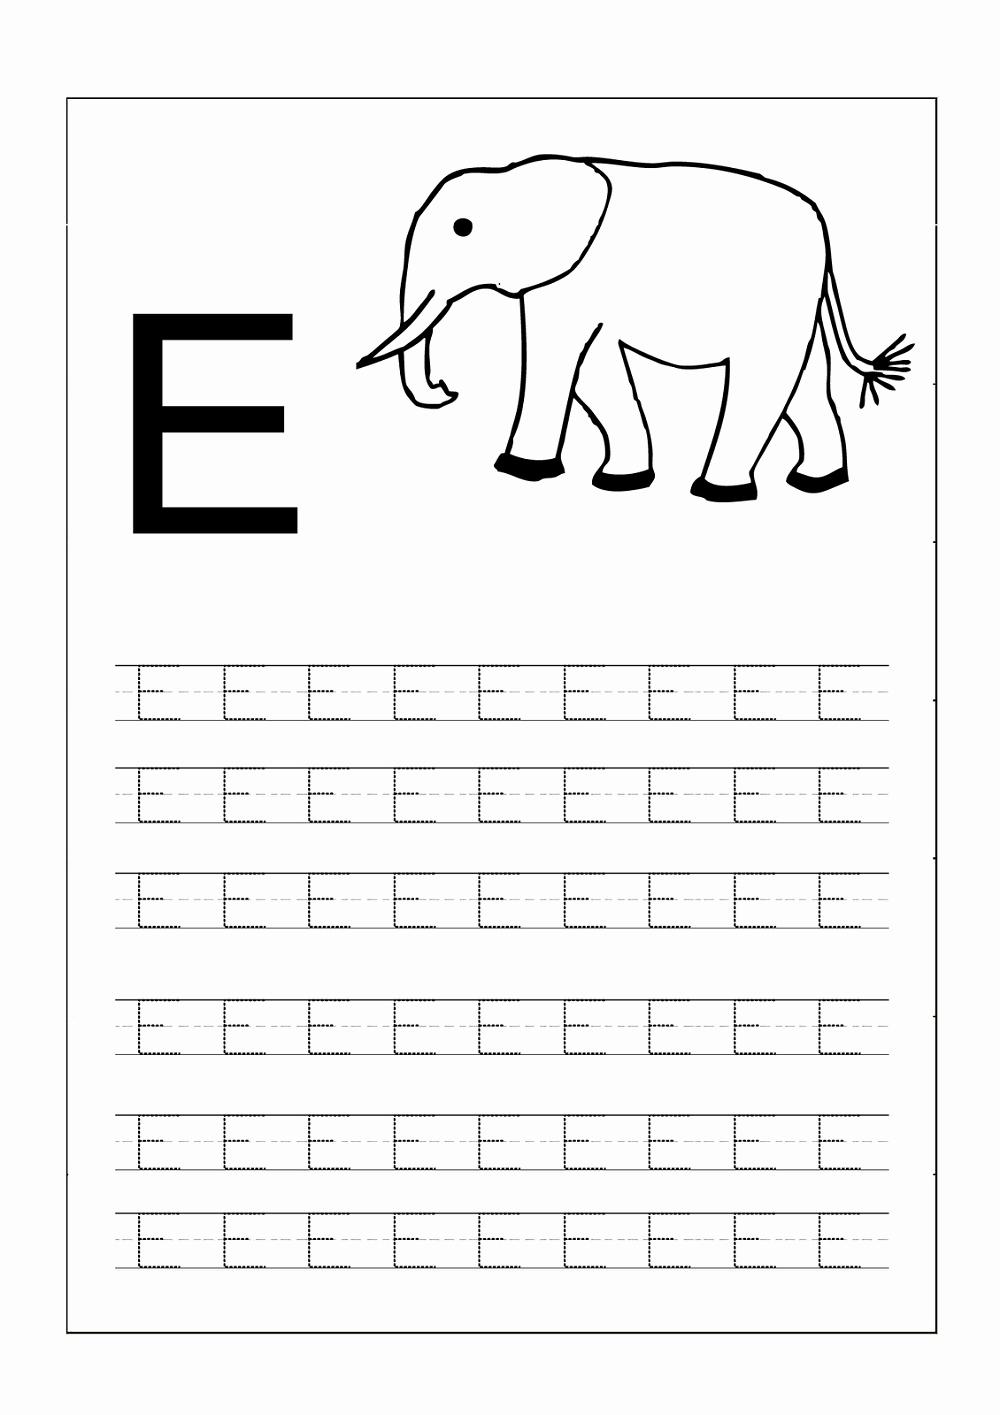 Alphabet Trace Worksheet Lovely Capital Alphabets Tracing Worksheets Printable